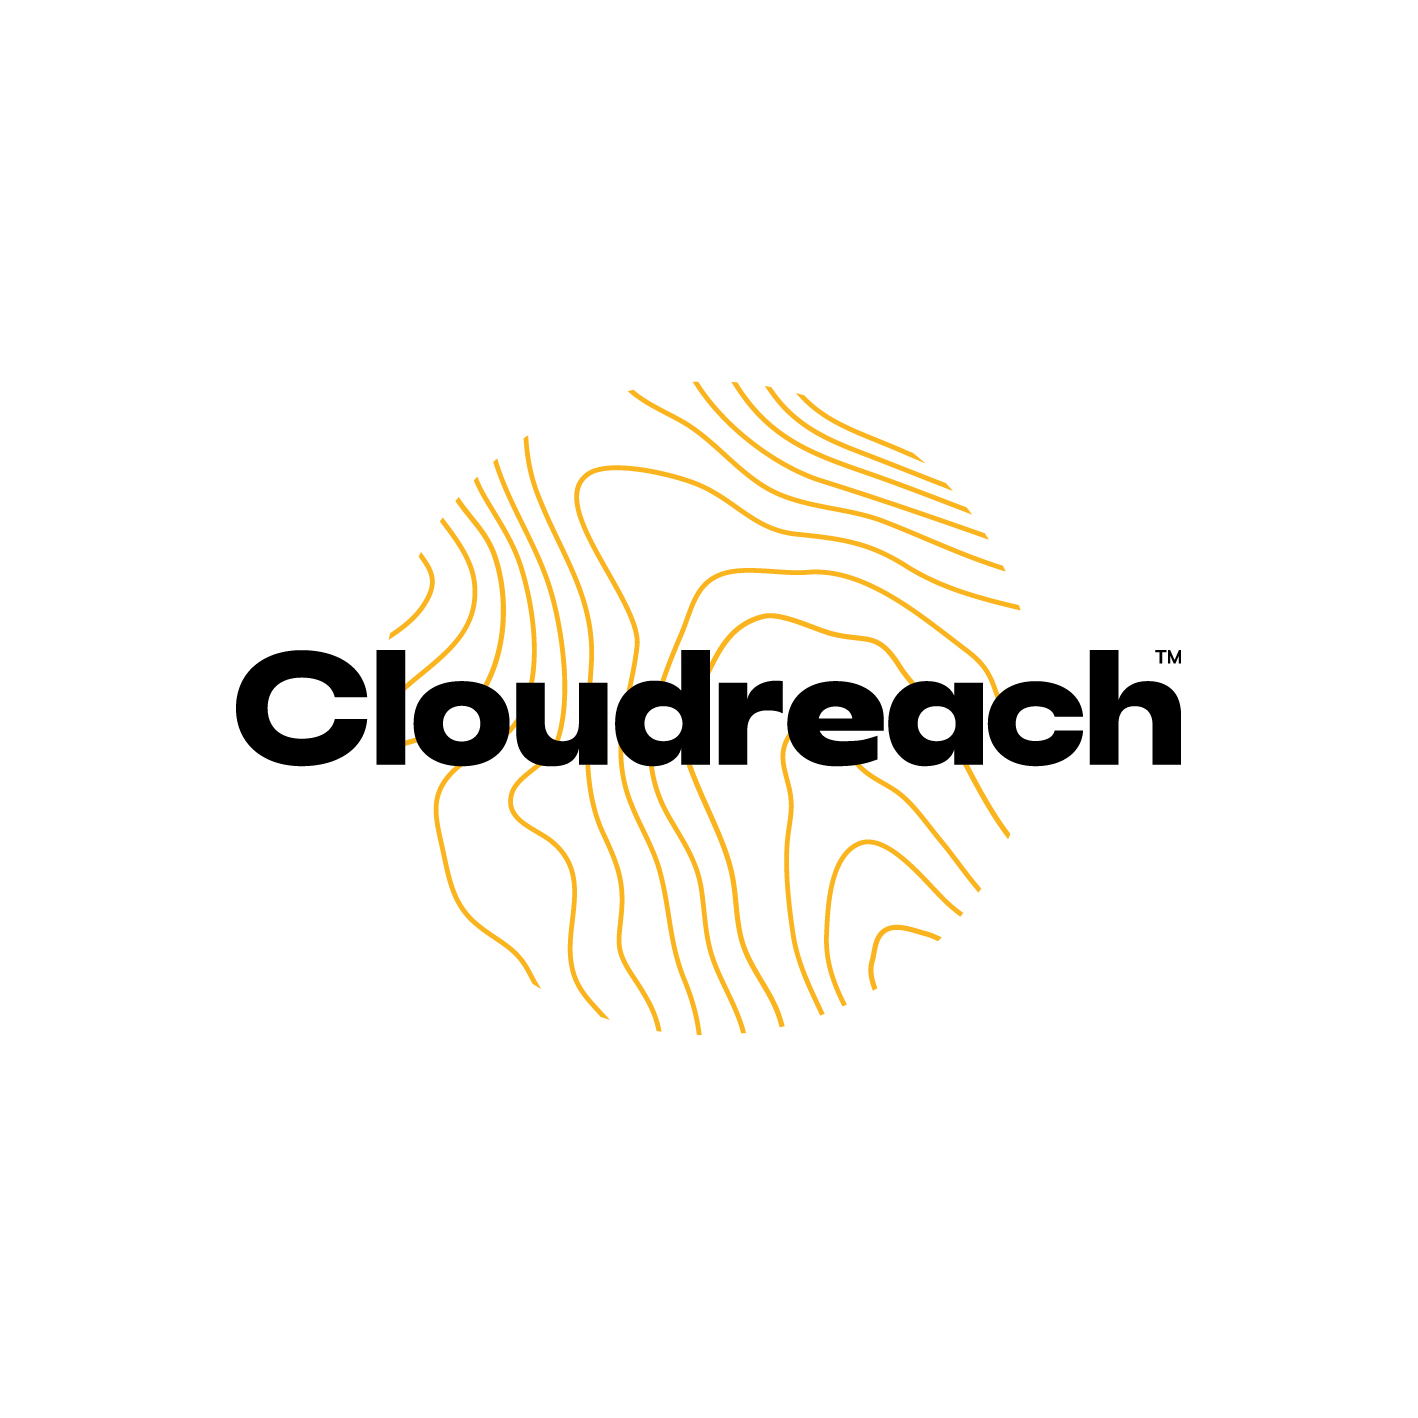 Partner: Cloudreach